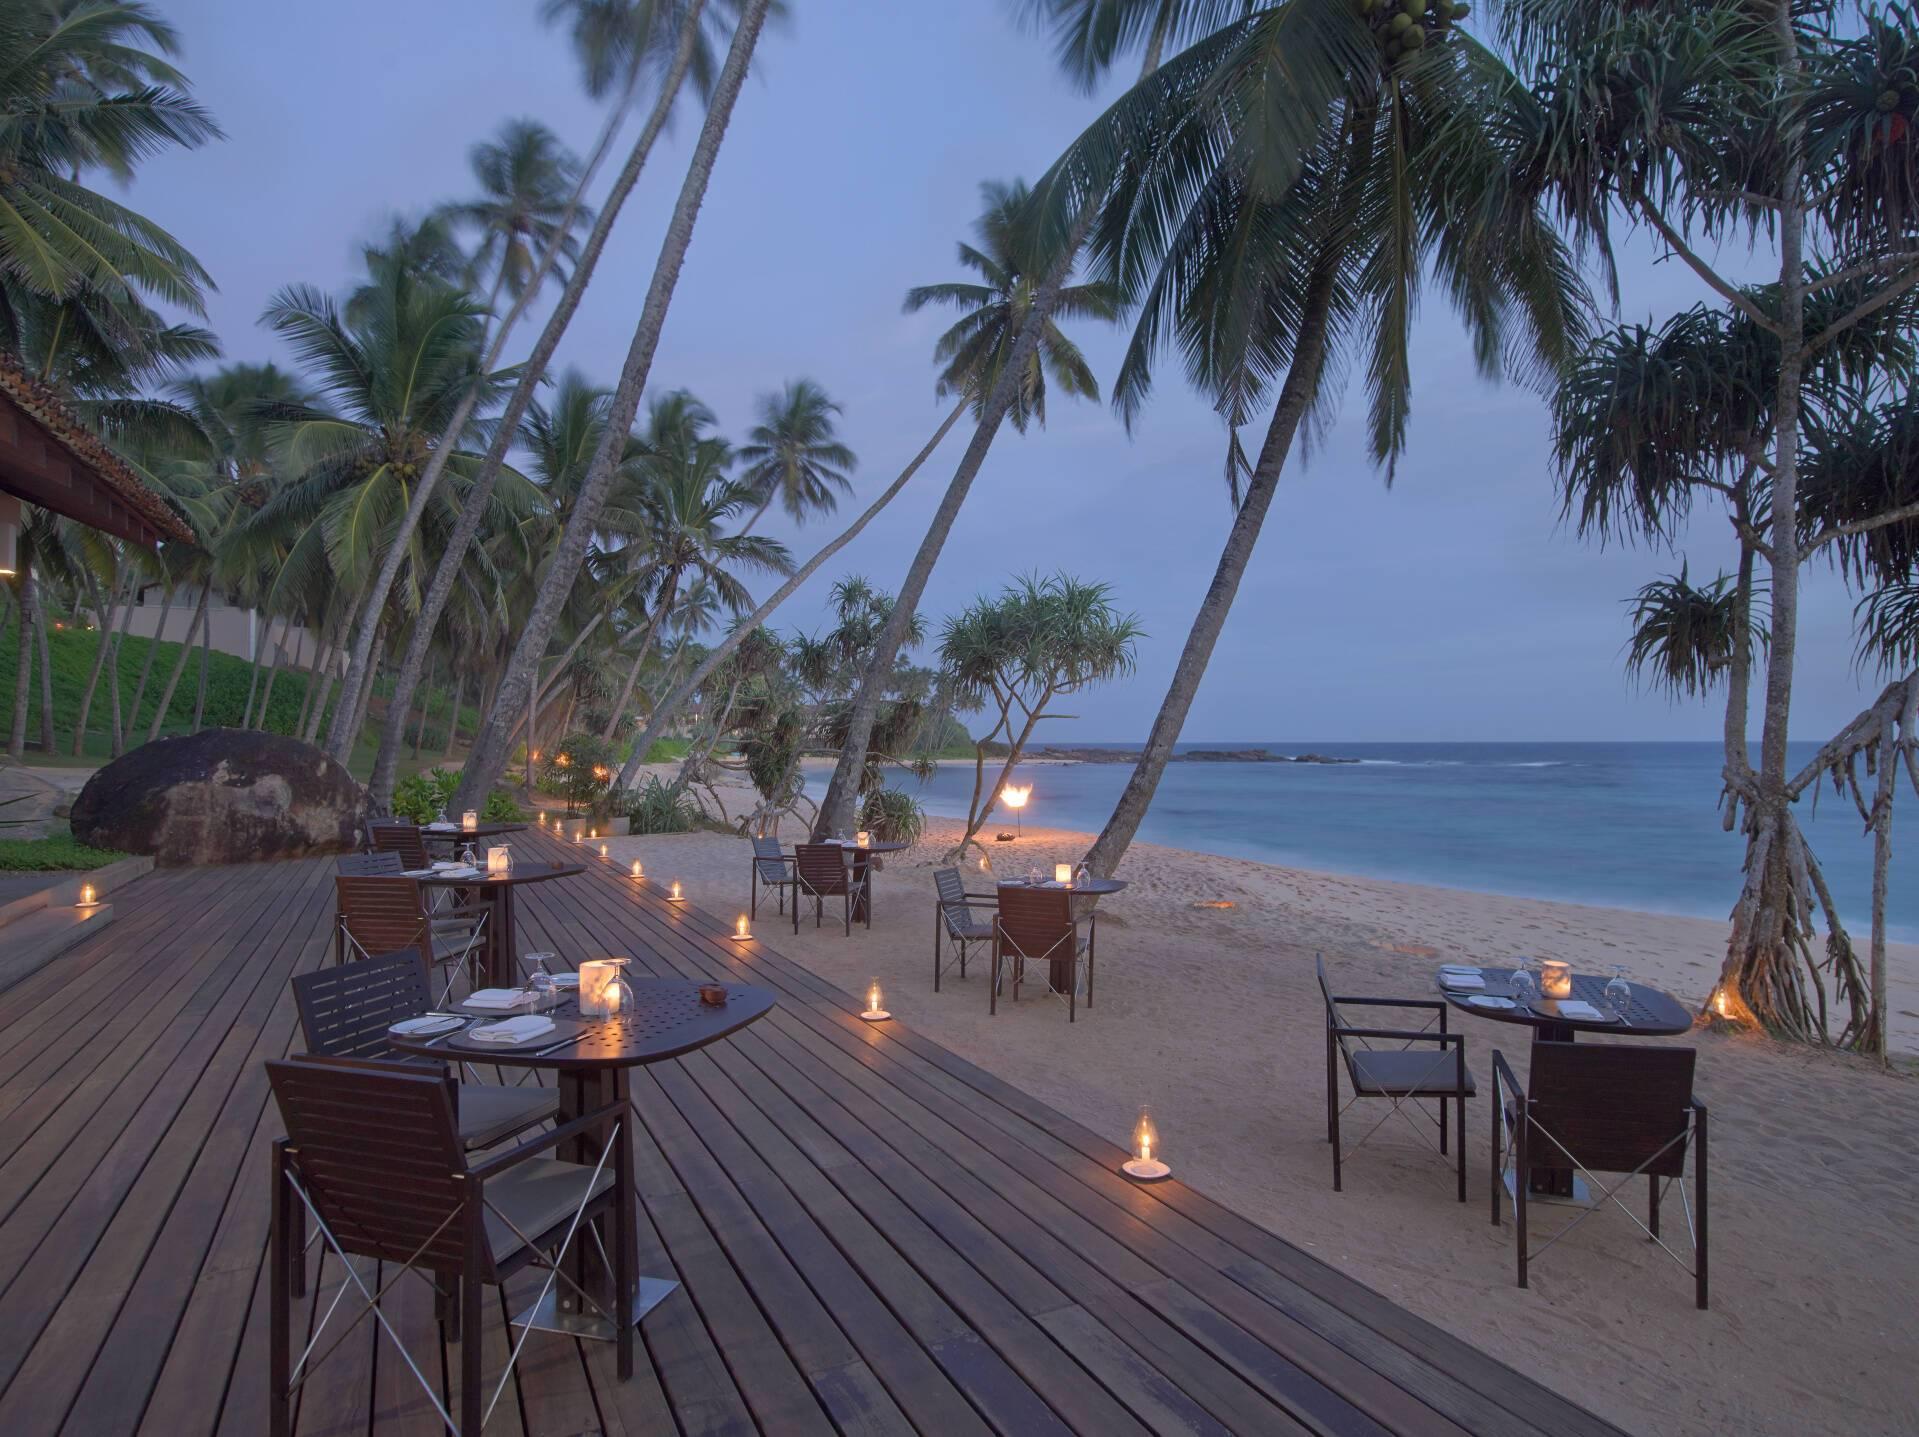 Amanwella Sri Lanka Coucher Soleil